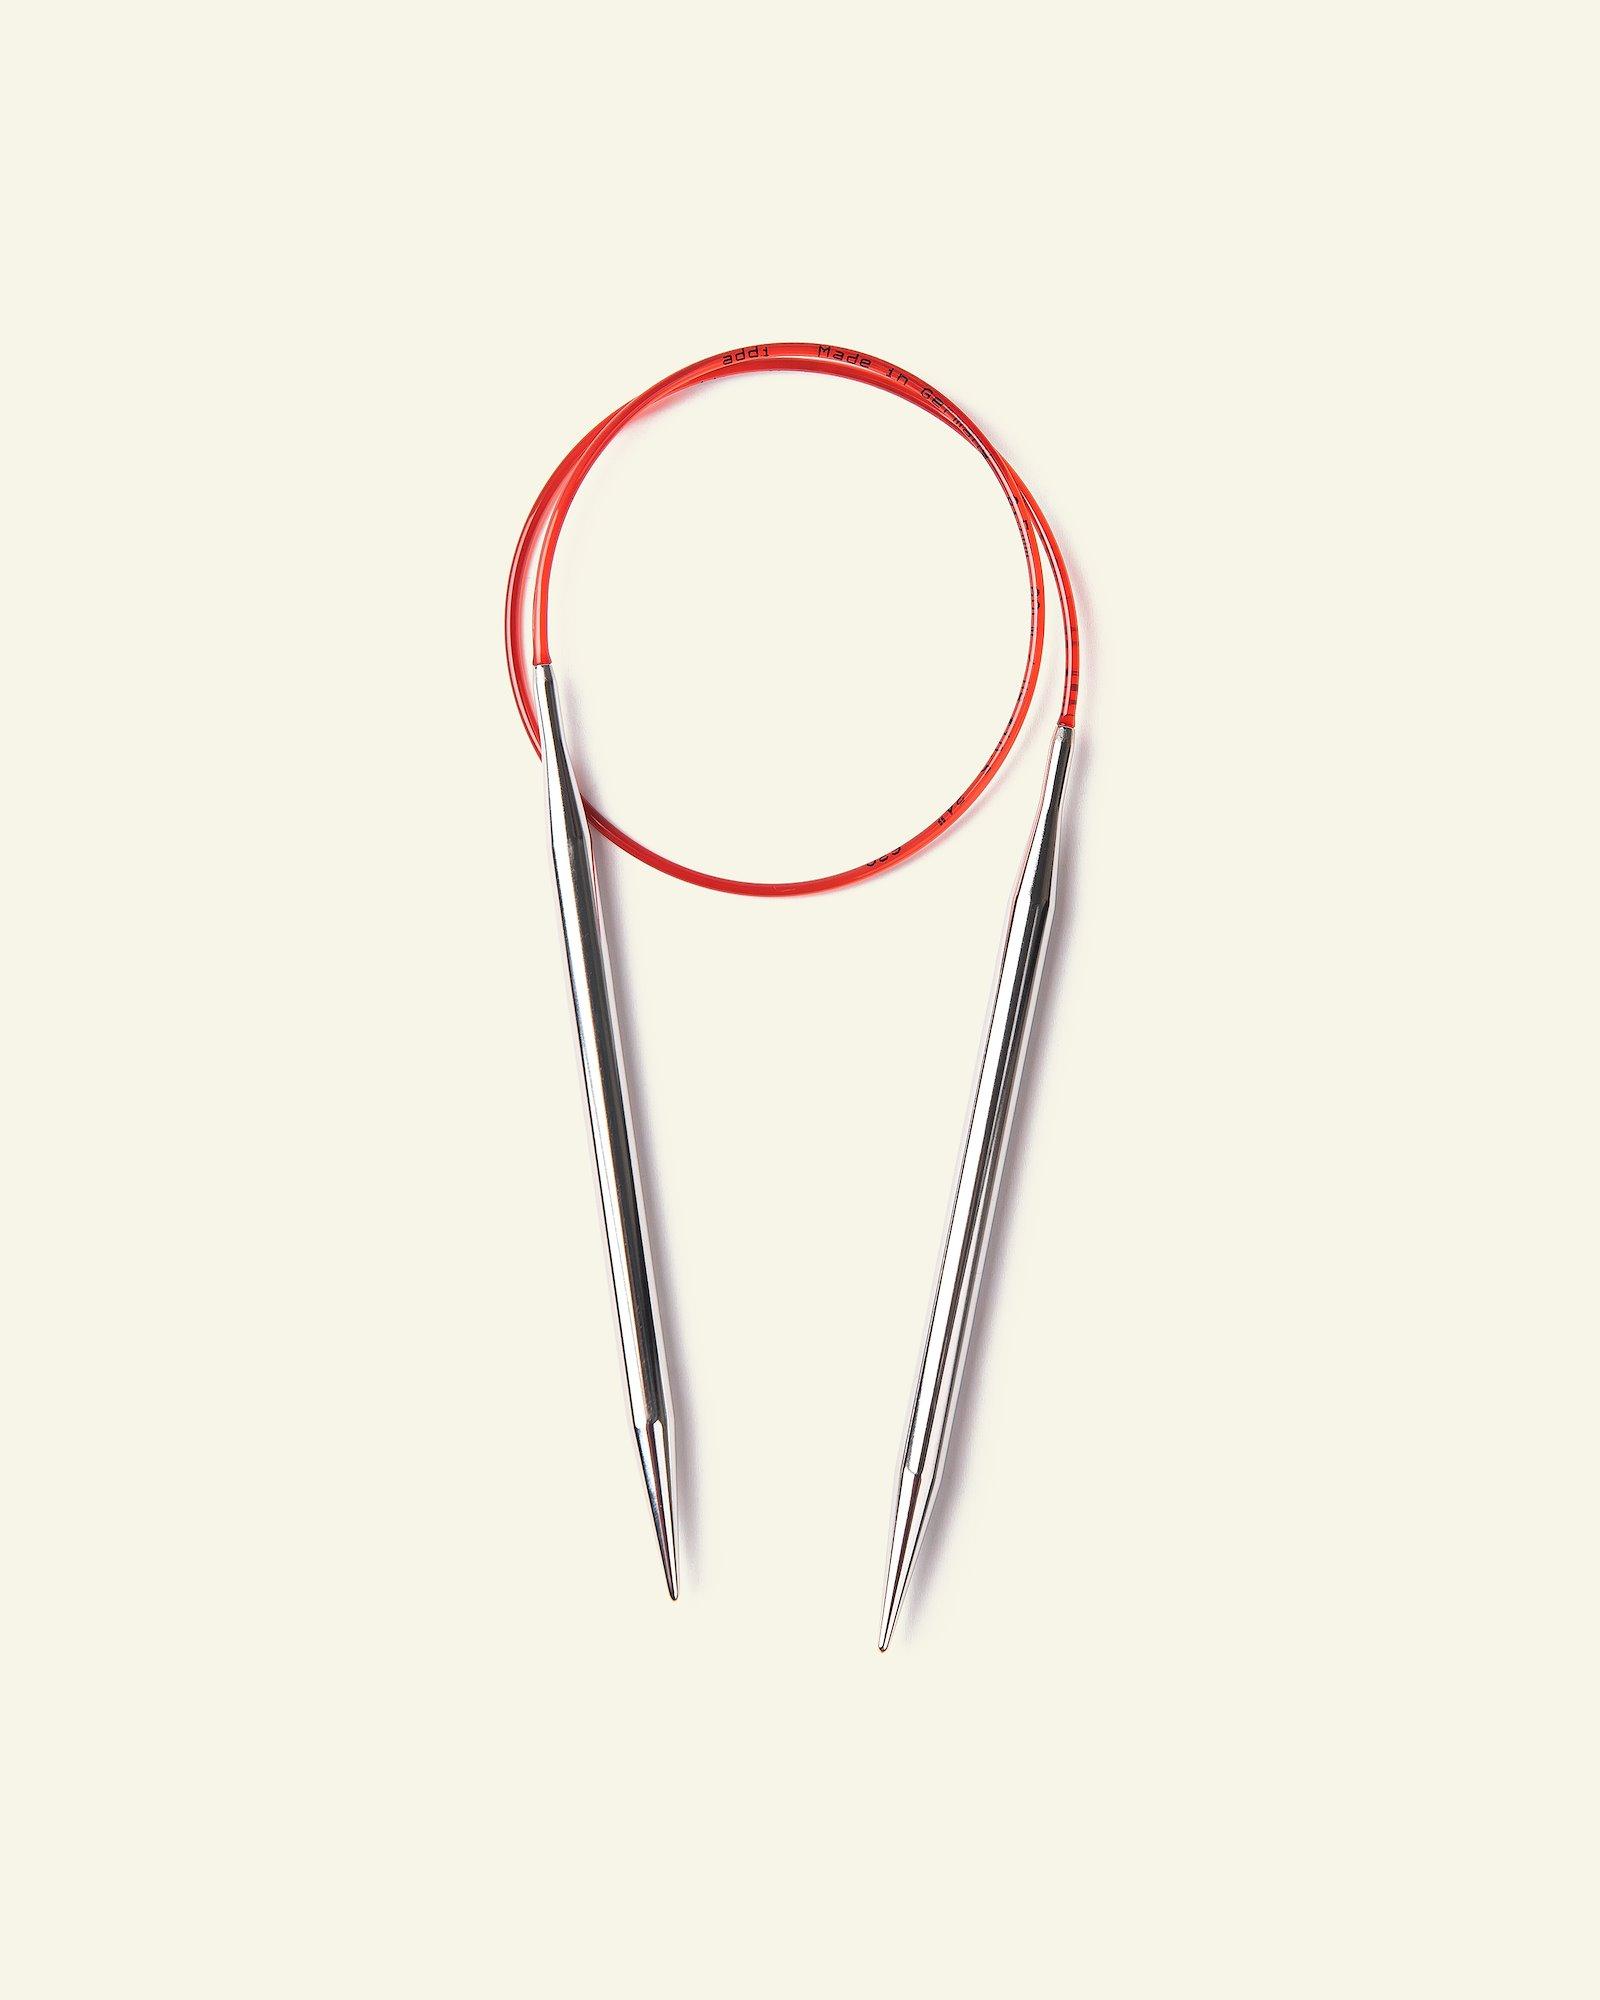 Addi Lace circular needle 60cm 8mm